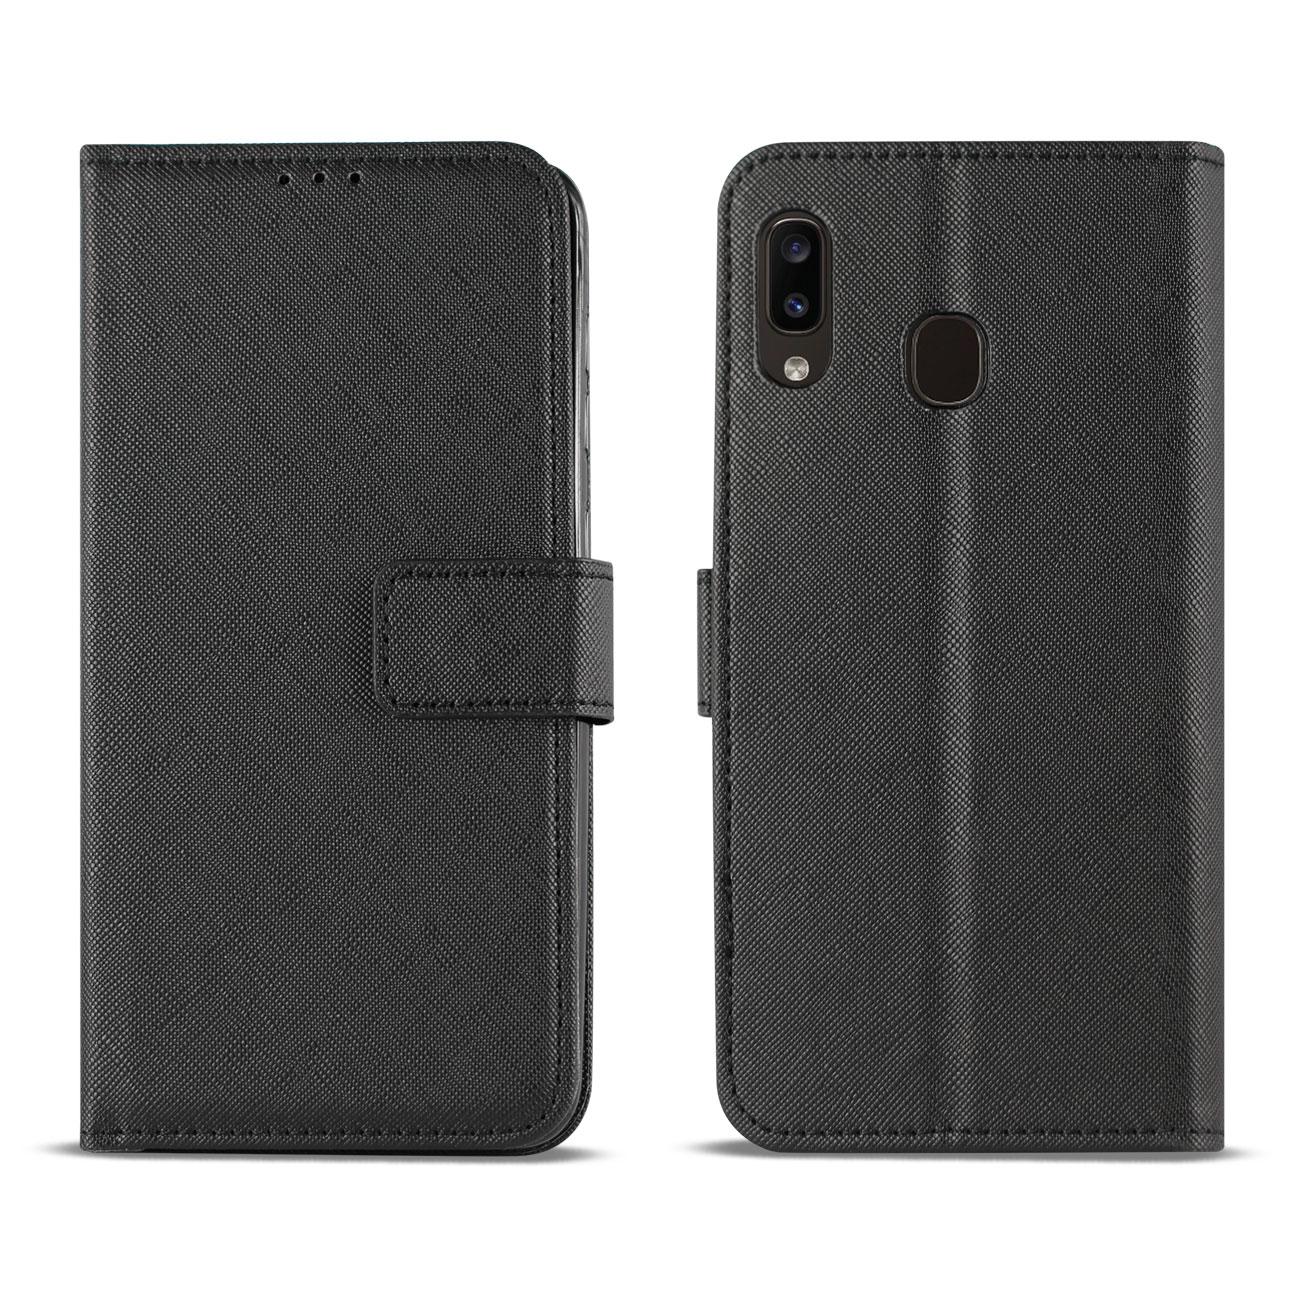 SAMSUNG GALAXY A10E 3-In-1 Wallet Case In BLACK